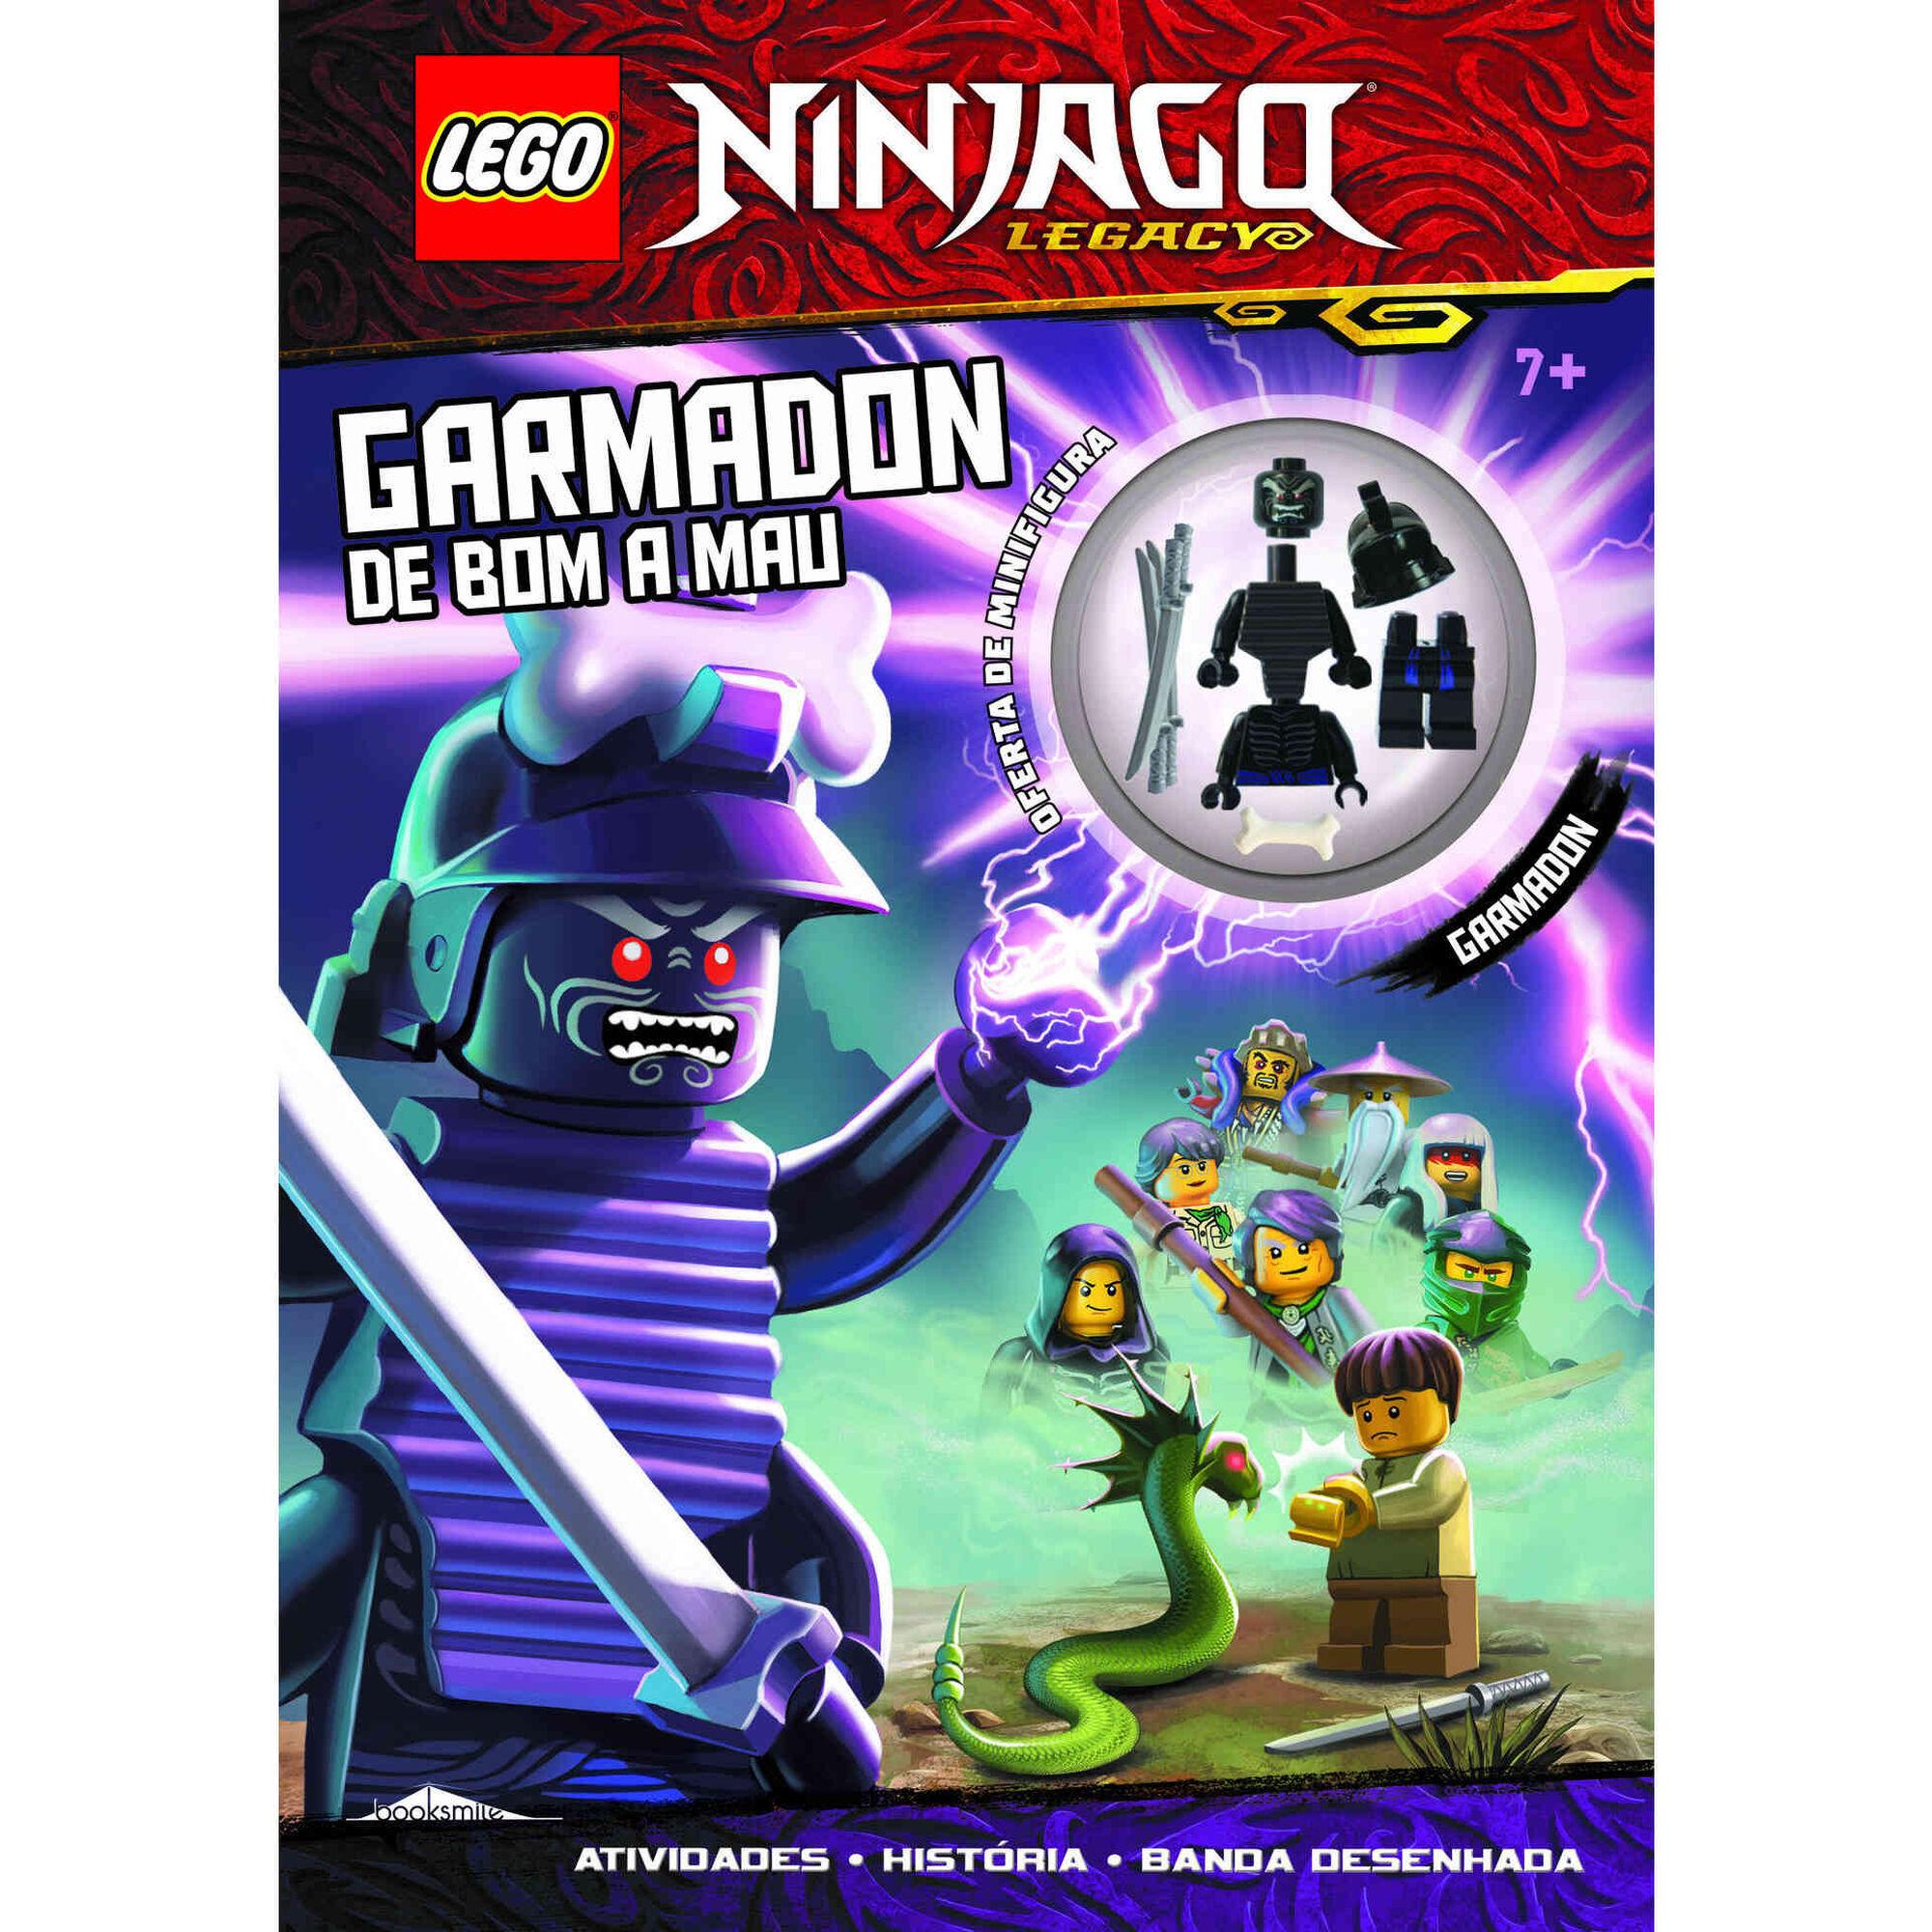 LEGO Ninjago - Garmadon: de Bom a Mau